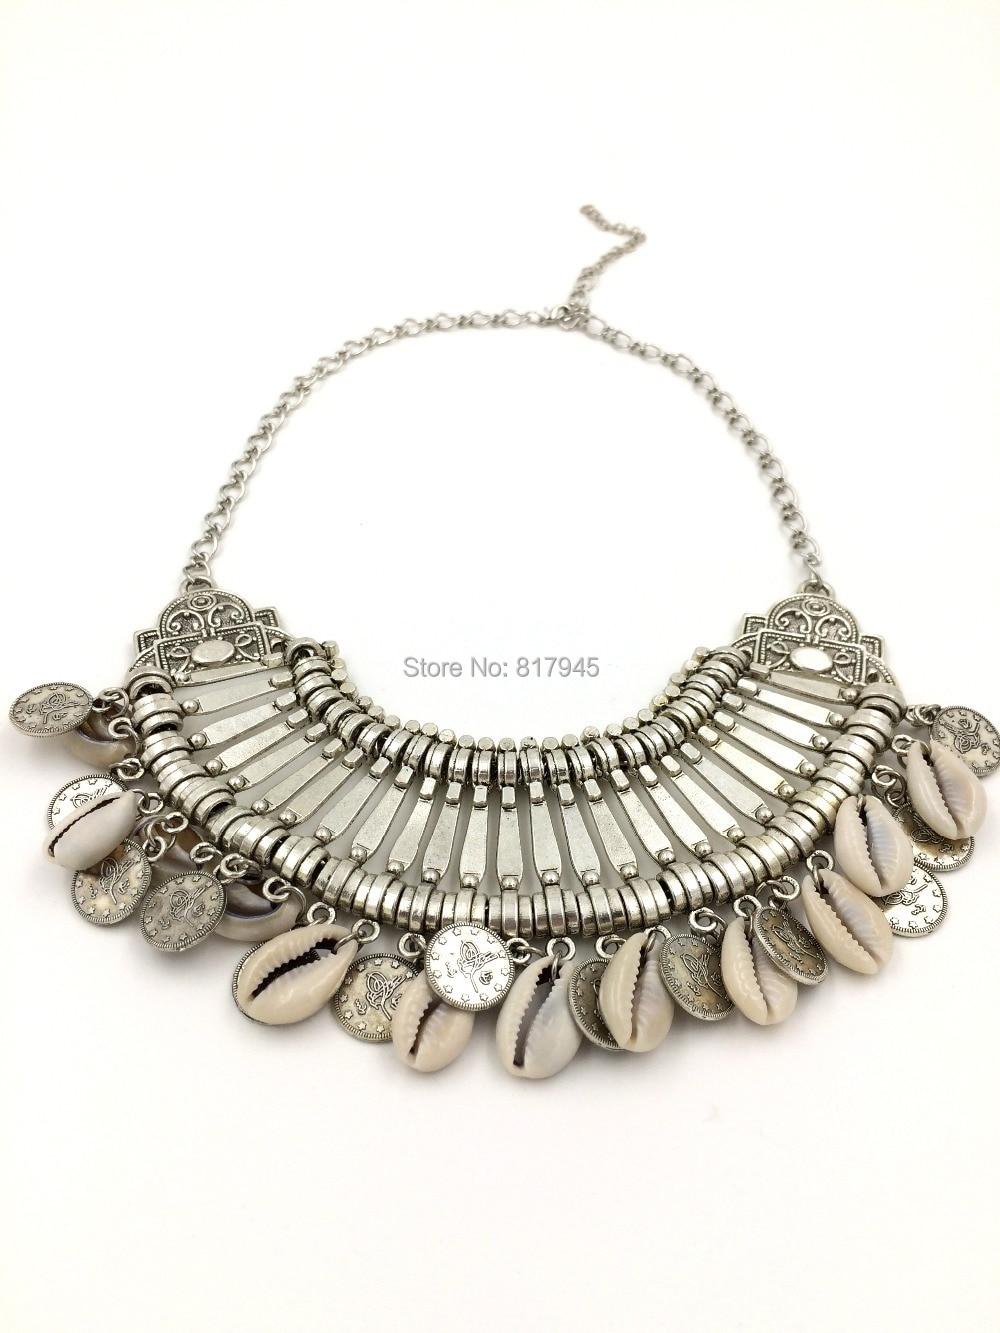 2016 New Fashion Jewelry Hand Make Necklace Wholesale